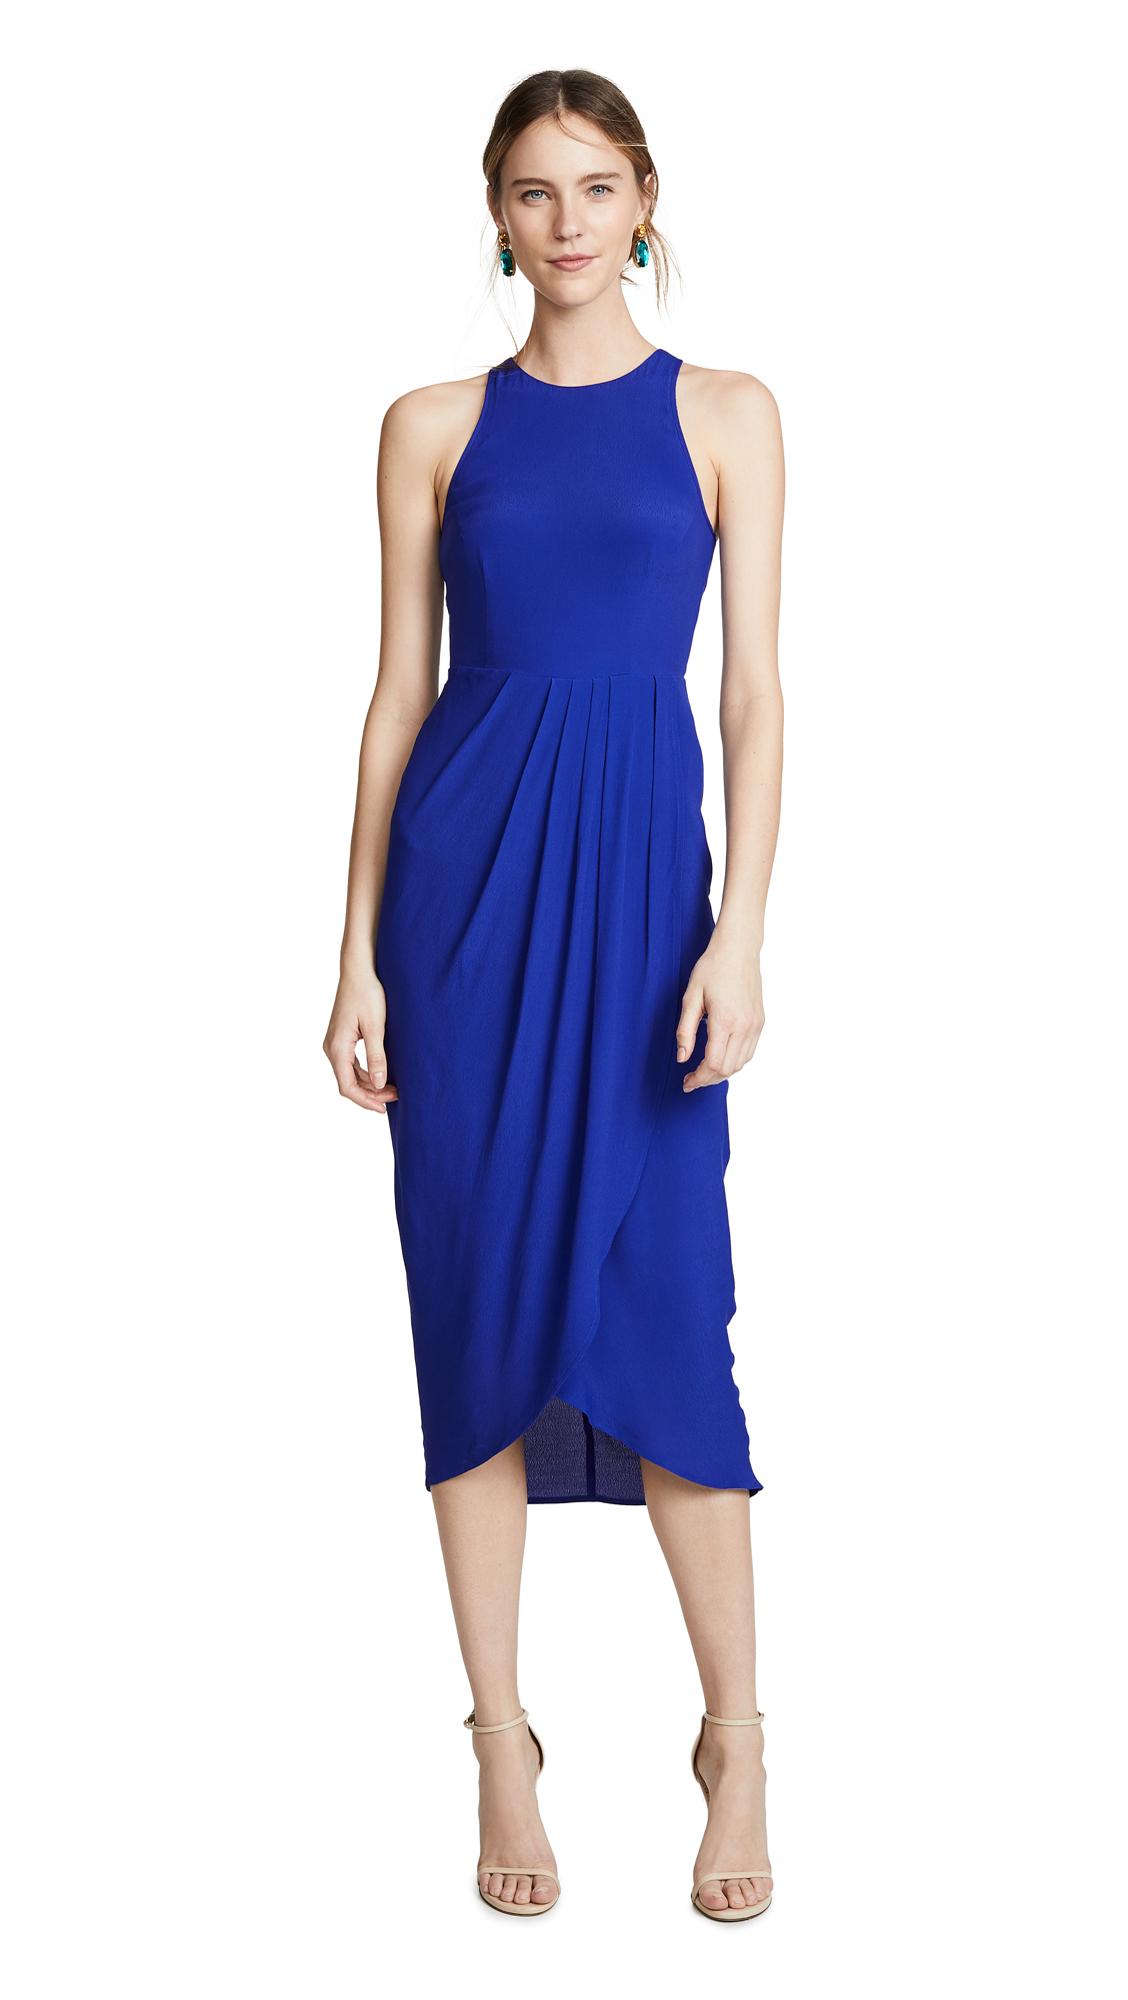 Yumi Kim So Social Maxi Dress - Royal Blue